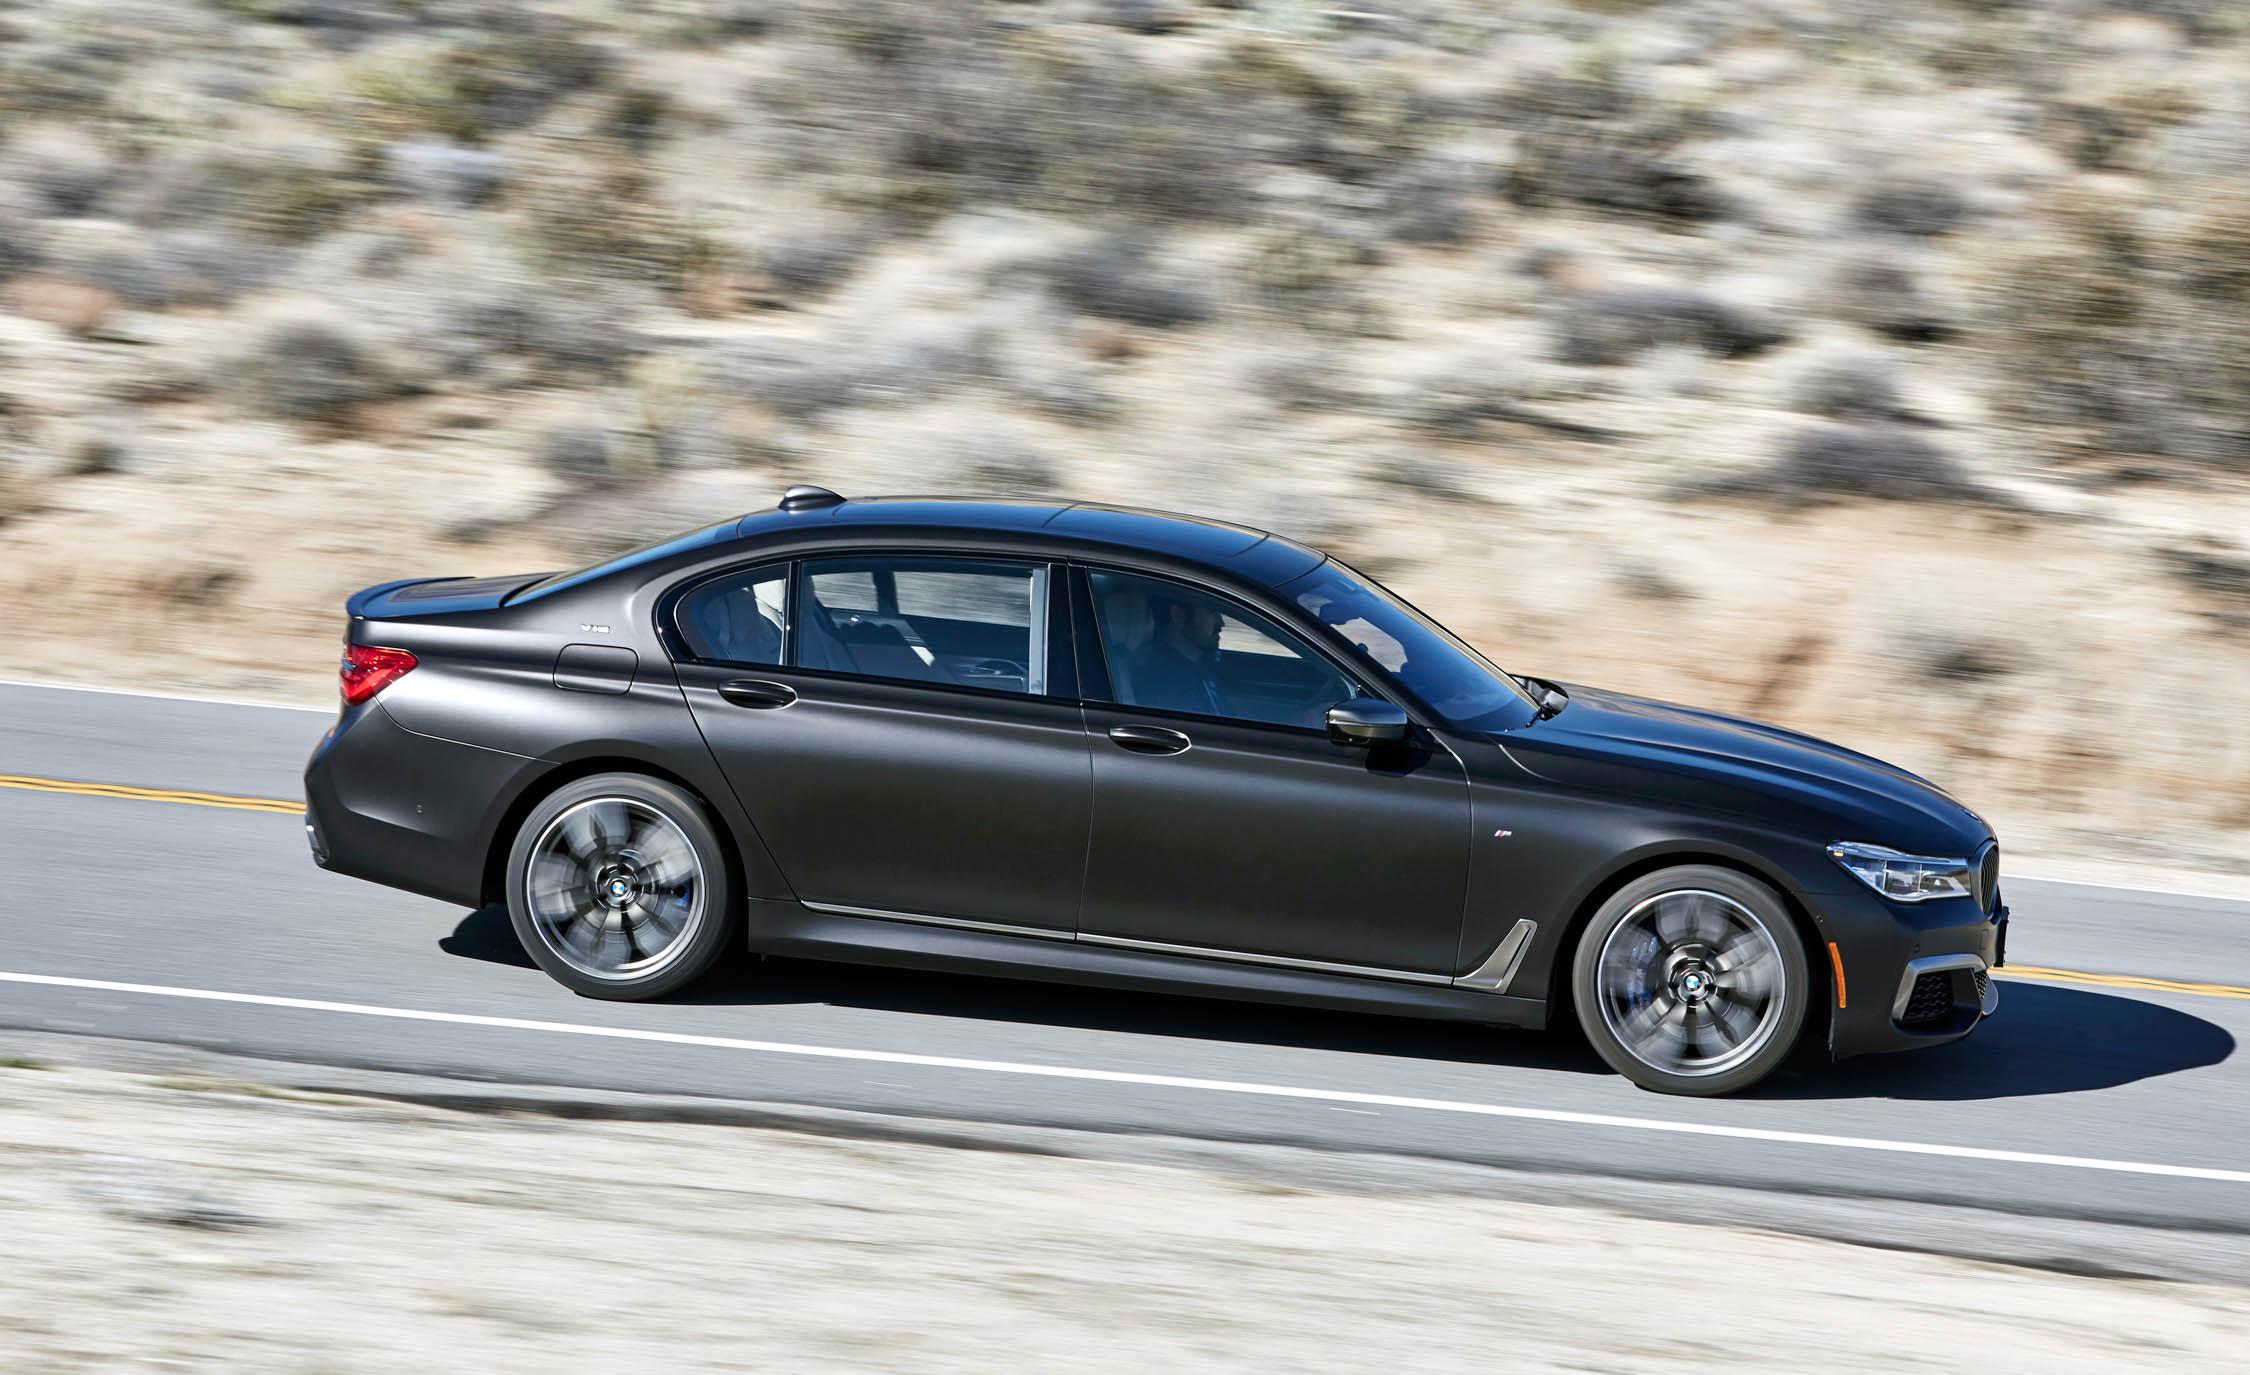 2017 BMW M760i XDrive Test Drive Grey Metallic Side View (View 12 of 76)